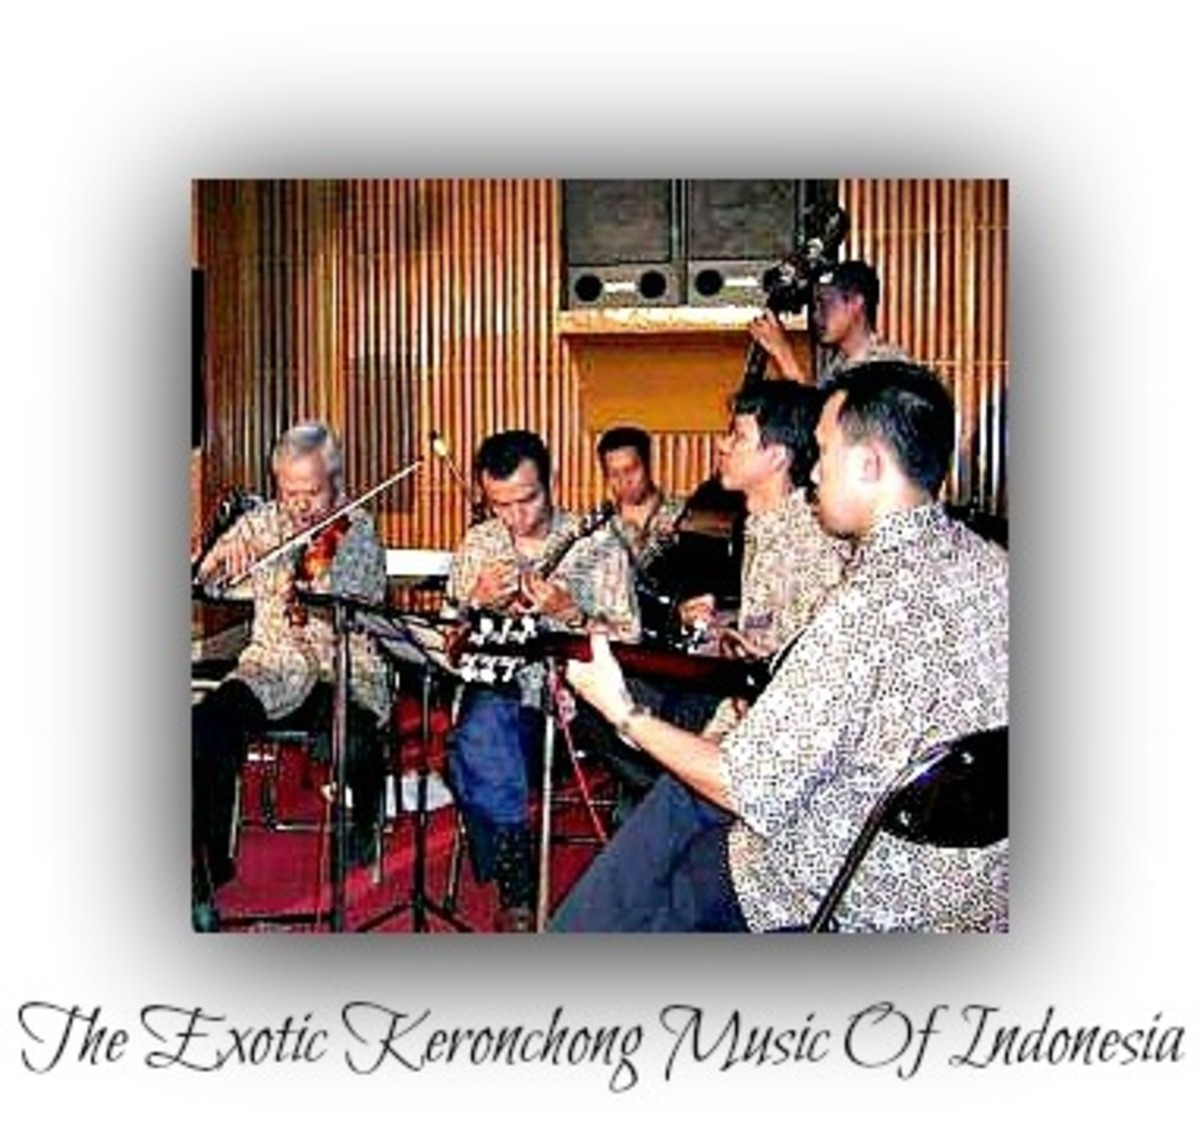 Keroncong Music Of Indonesia